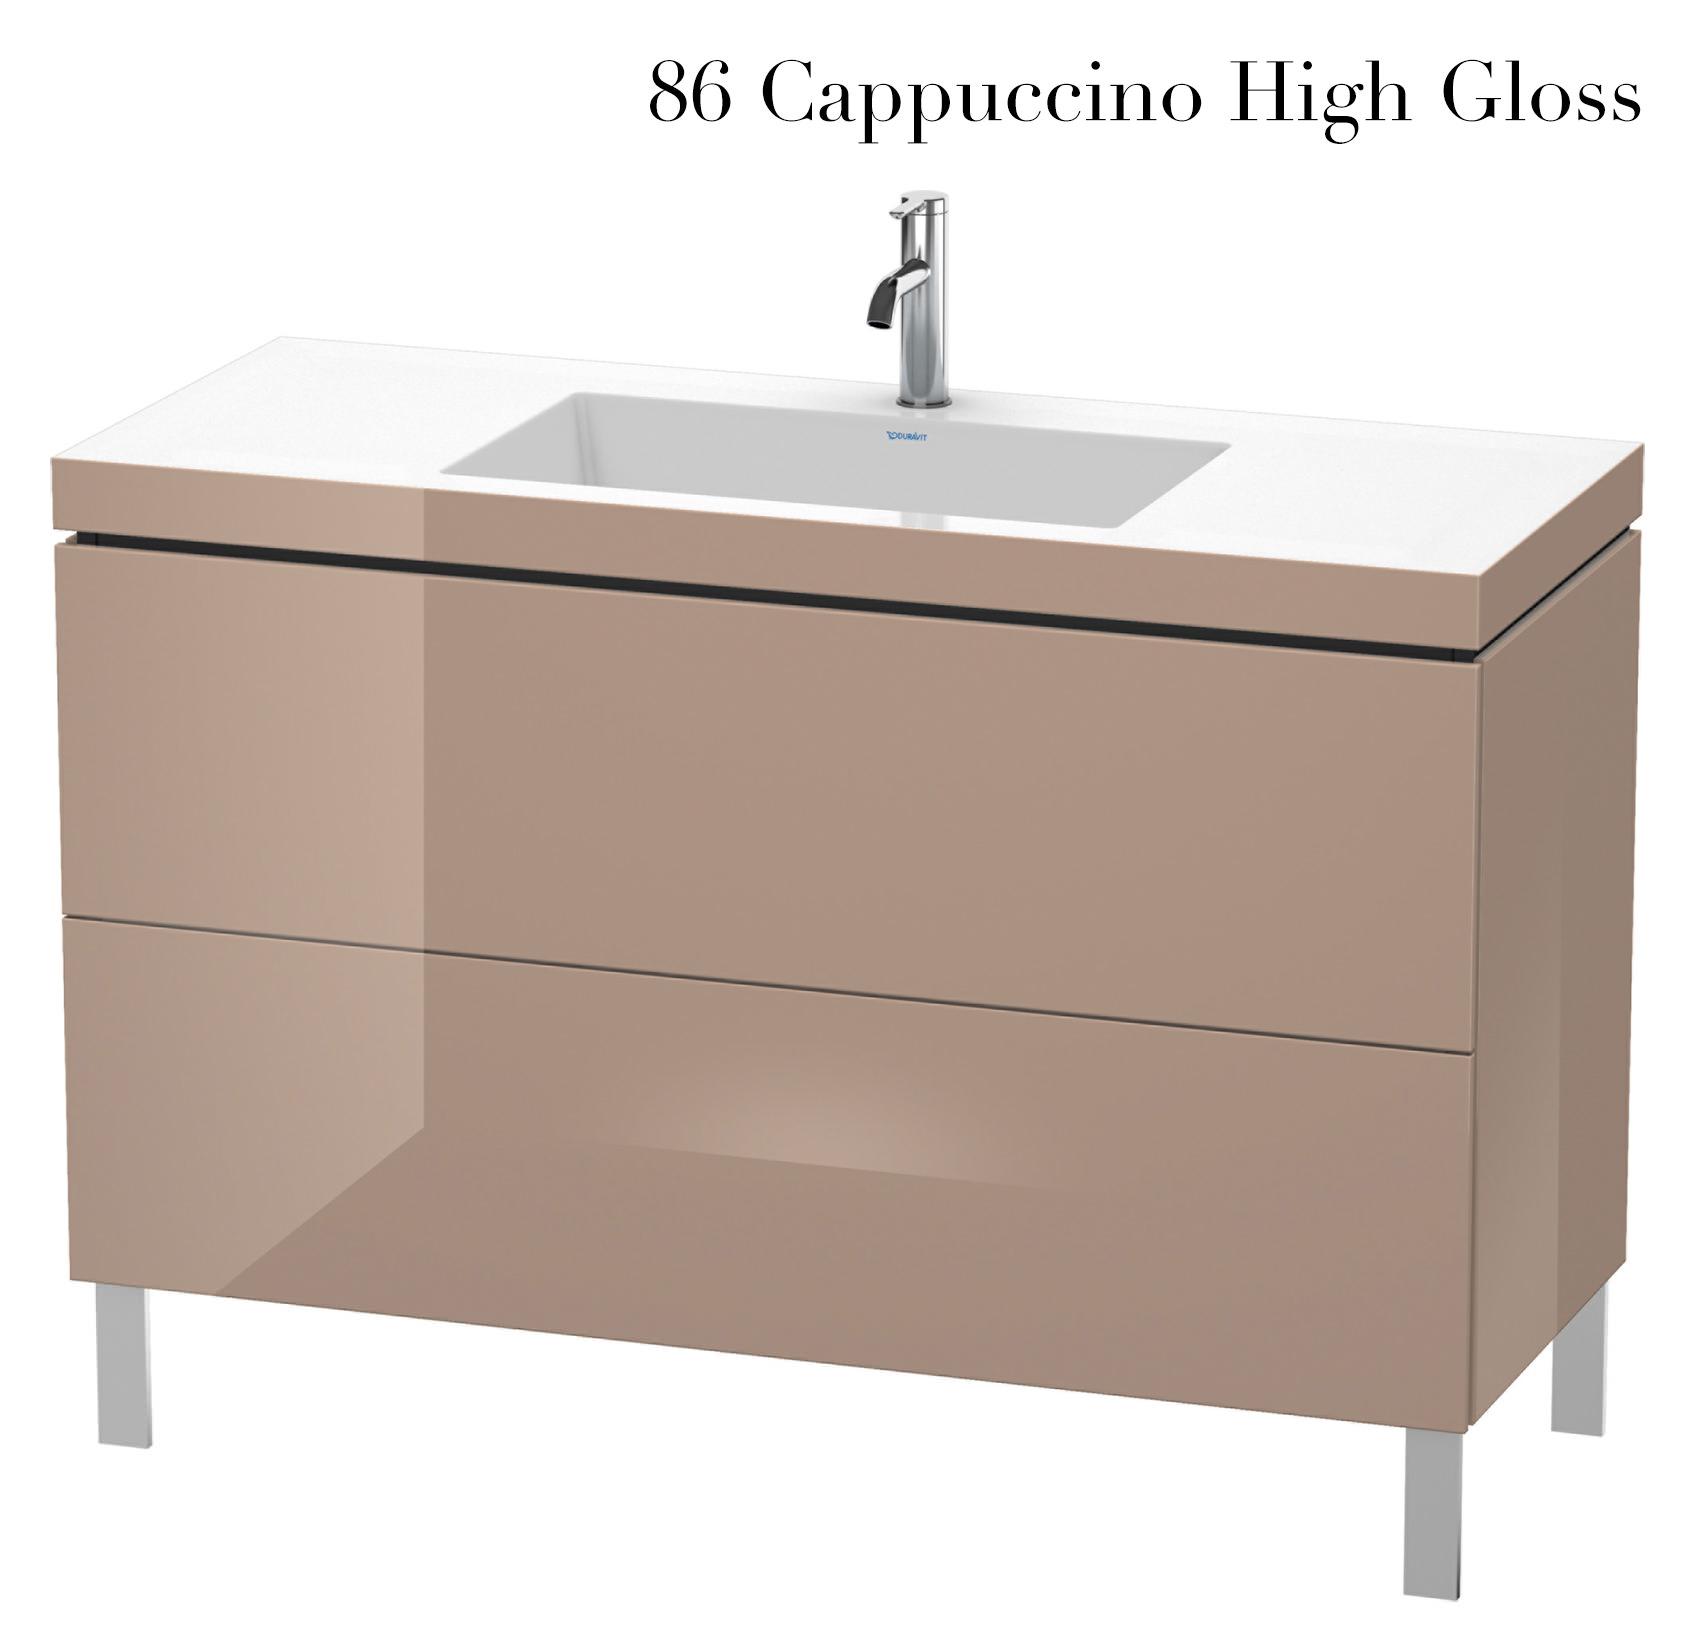 duravit l cube 1200mm floor standing vanity unit with c bonded basin. Black Bedroom Furniture Sets. Home Design Ideas